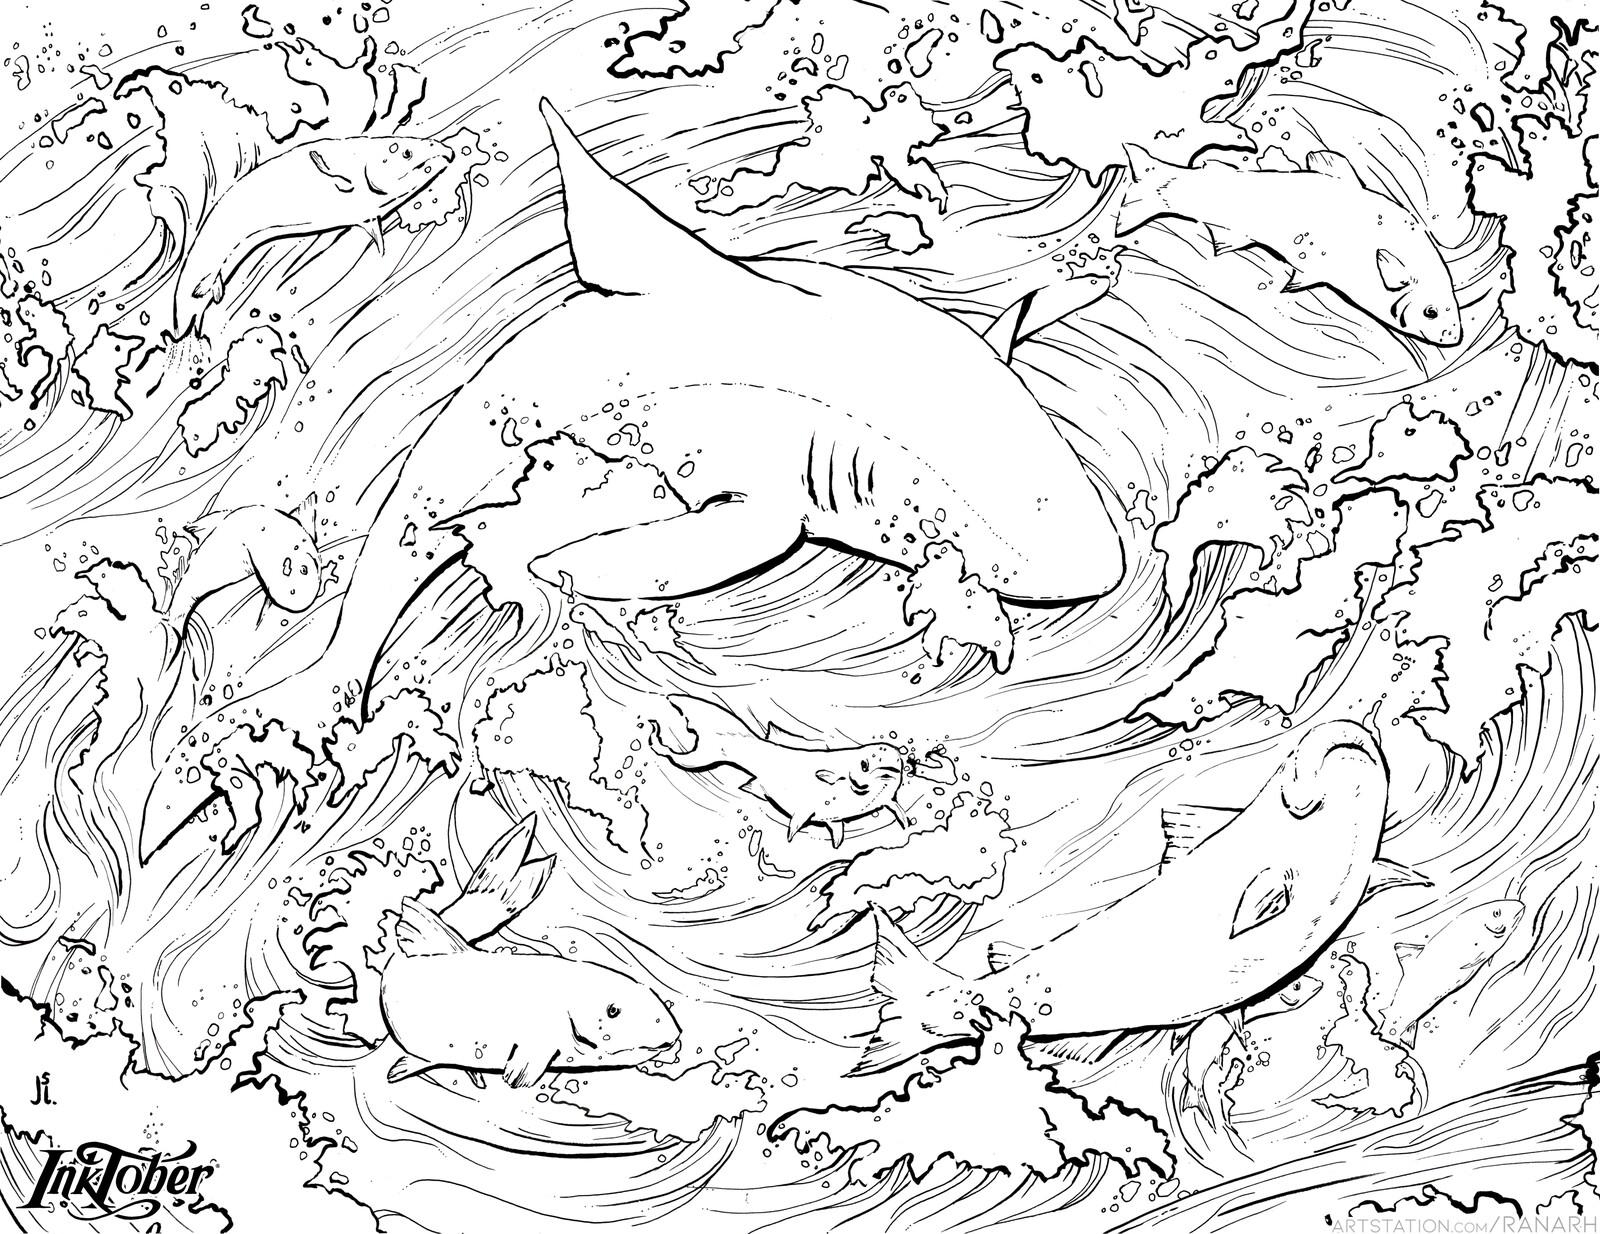 1. Fish Shark Jump